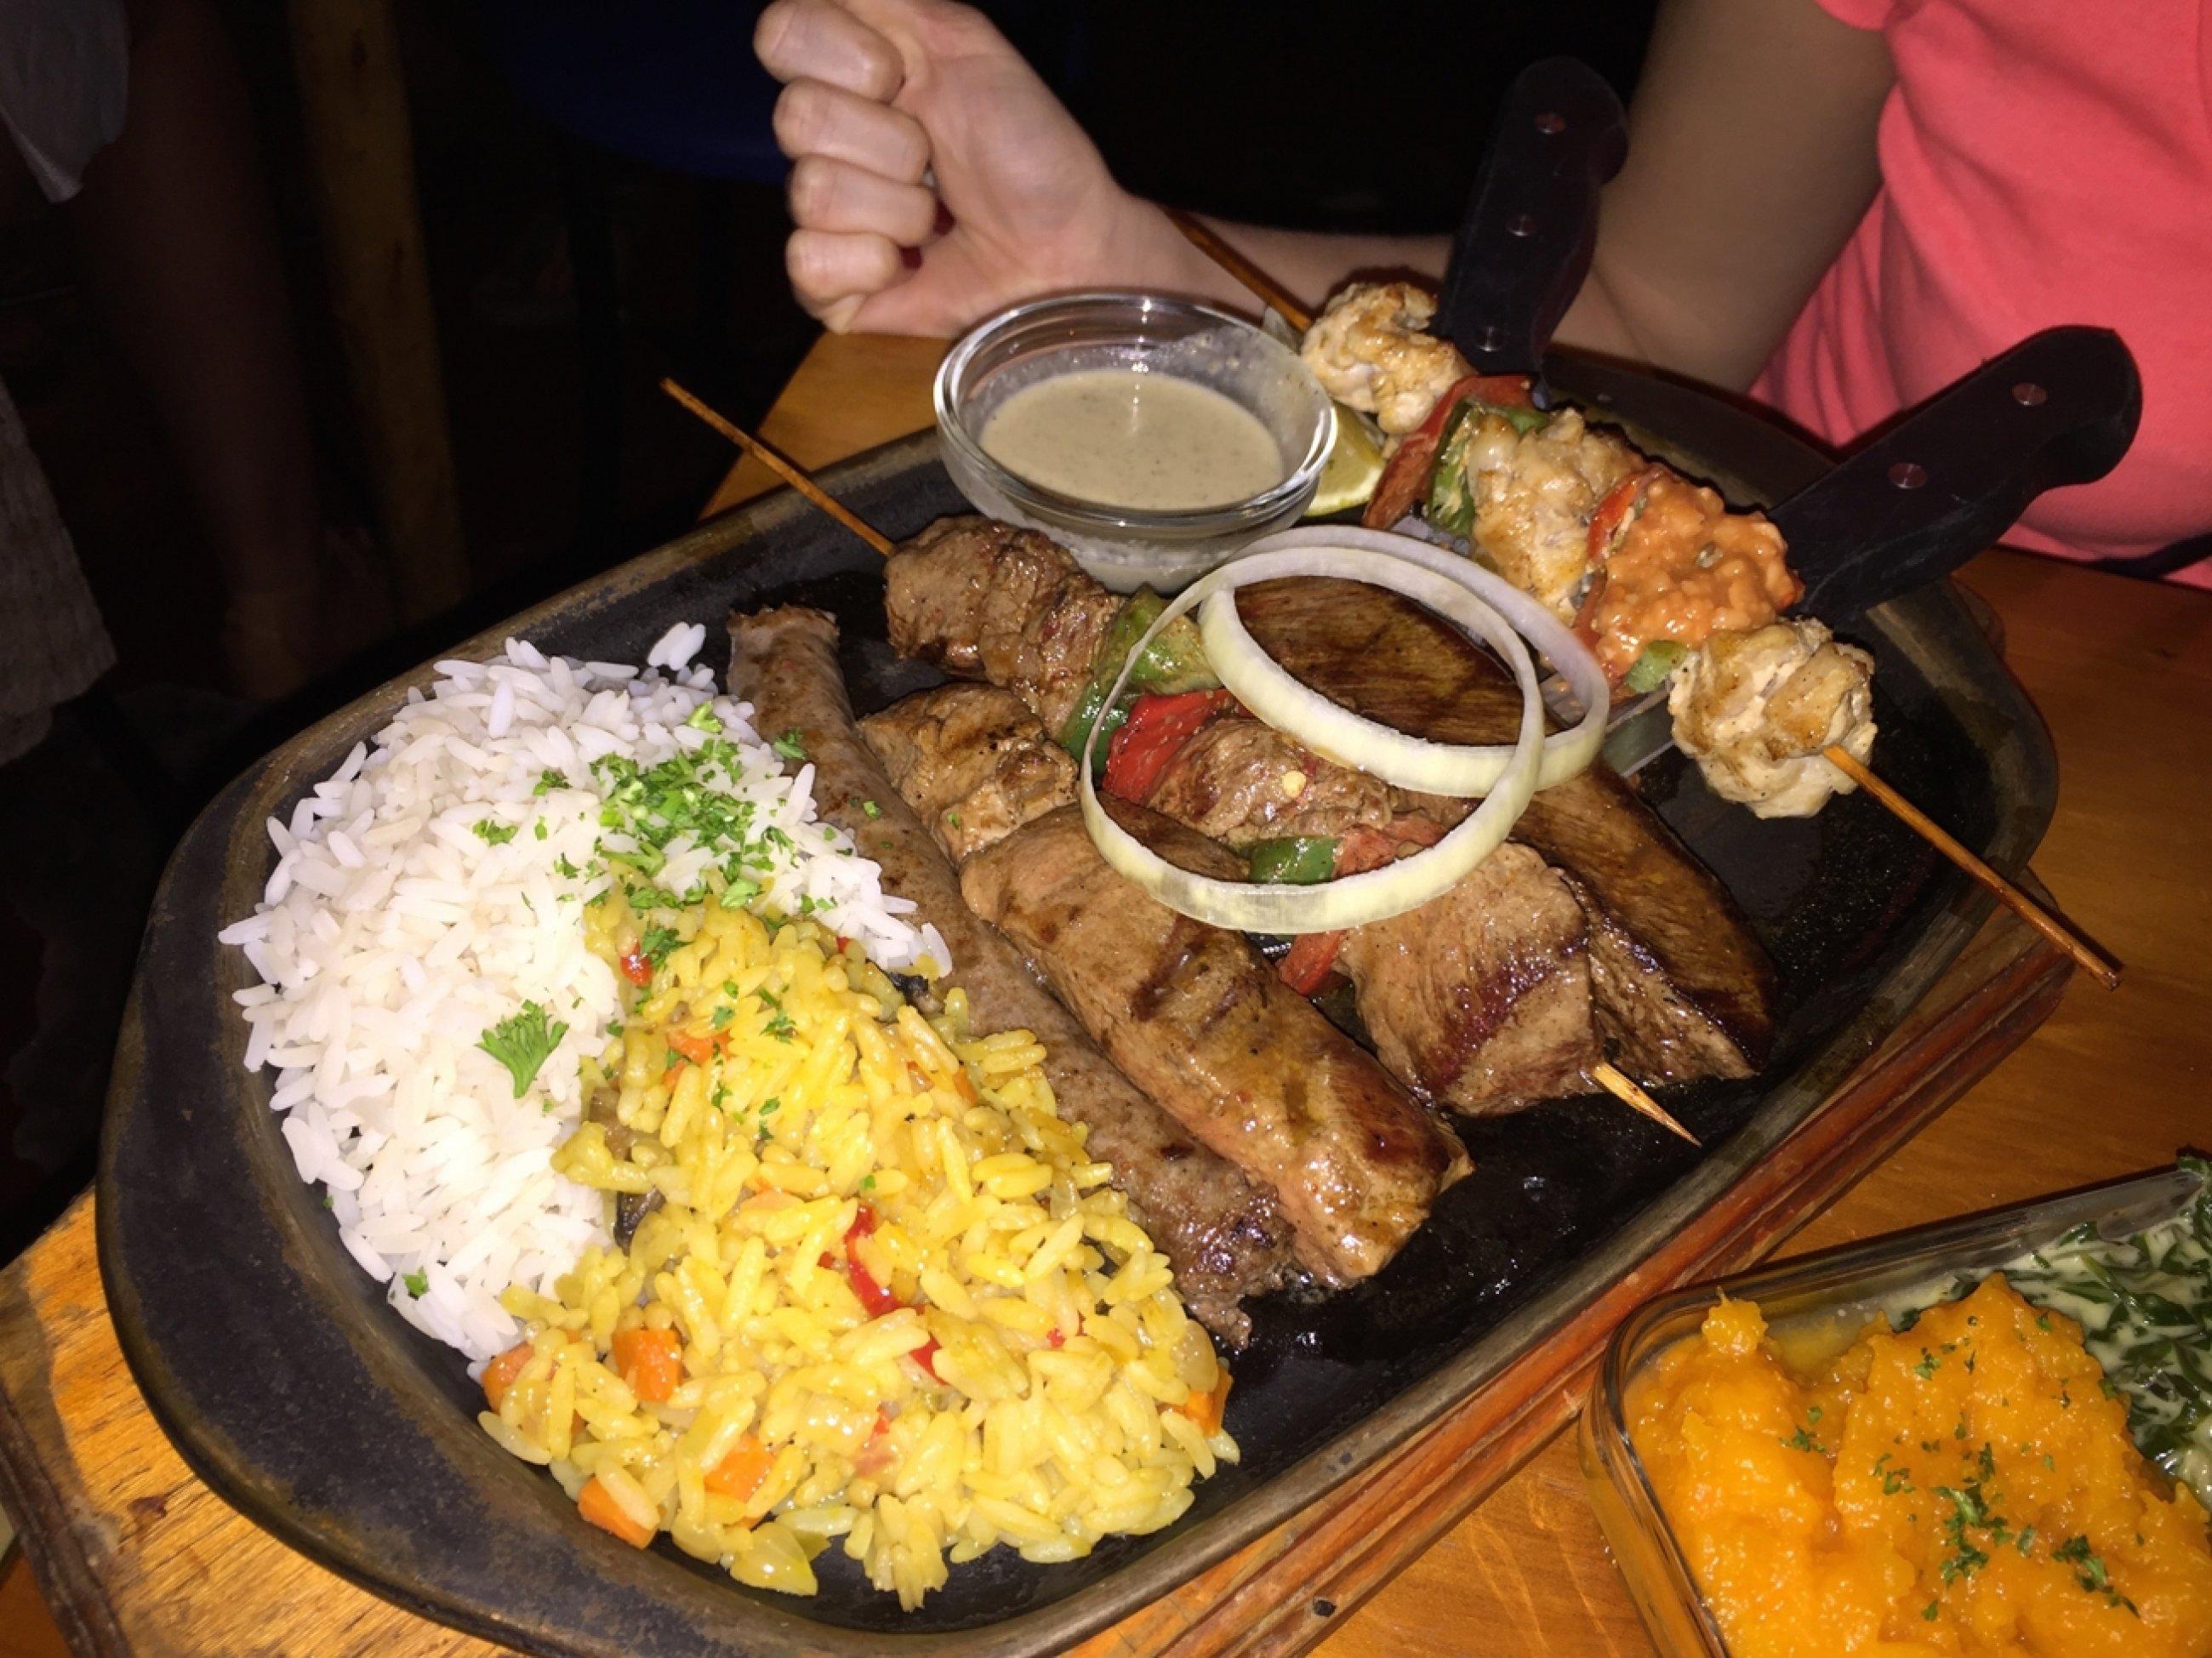 https://bubo.sk/uploads/galleries/16007/8-long-street-a-restauracia-kde-hraju-africku-hudnu.-na-tan-ieri-krokodil-pstros-kudu-a-...jpg